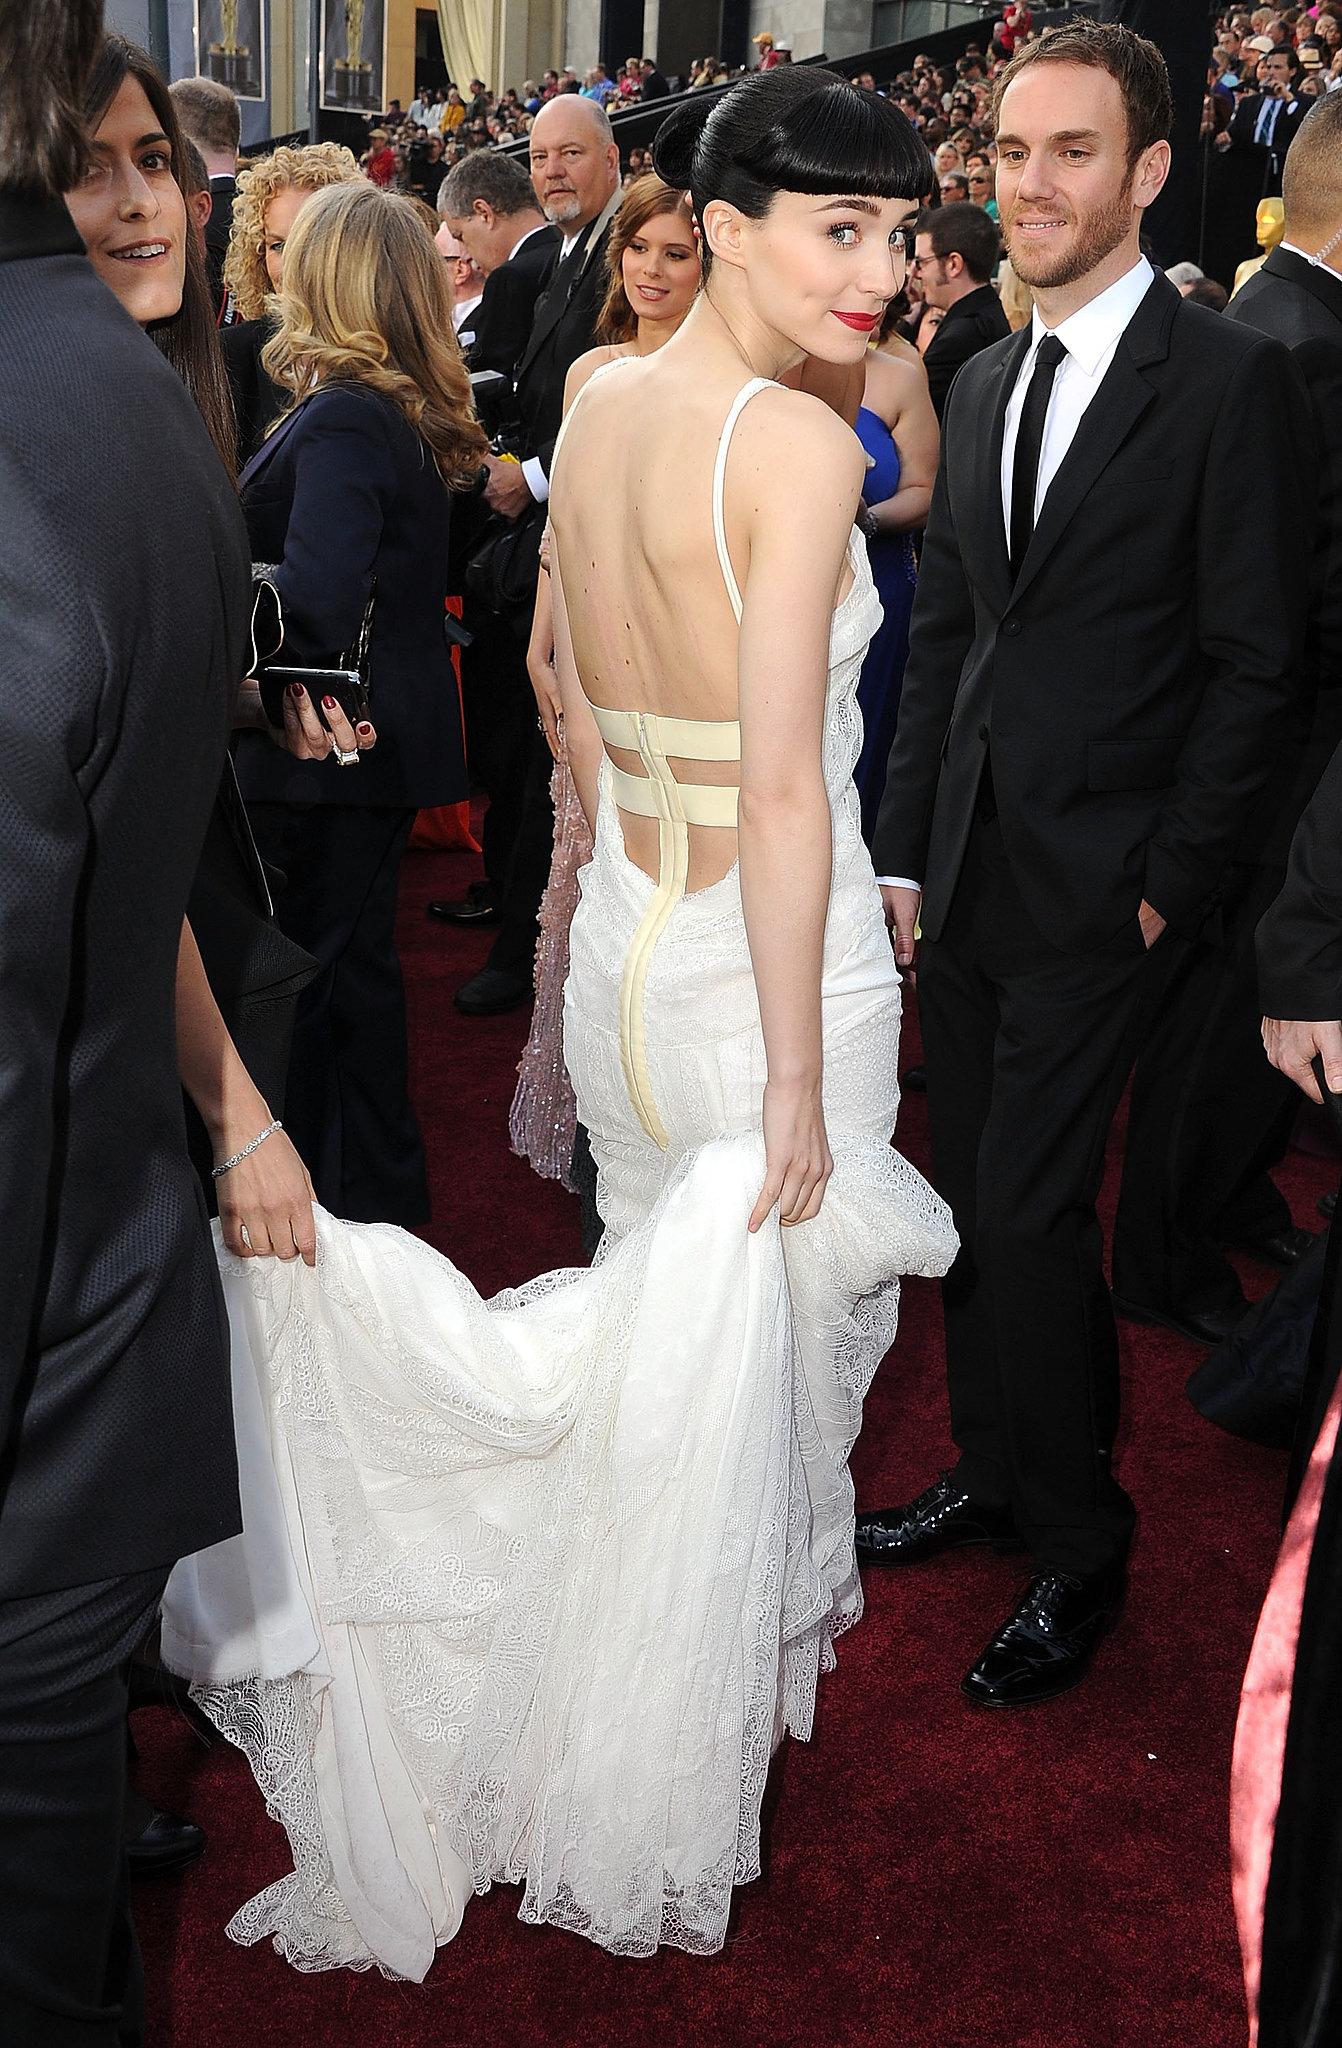 Rooney Mara in Givenchy at the 2012 Oscars